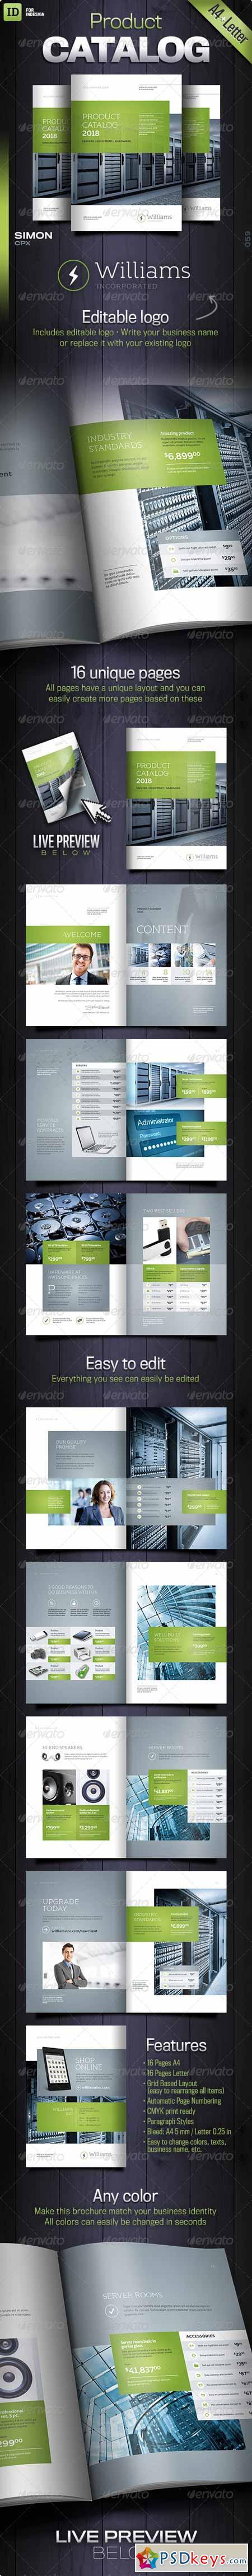 Product Catalog - Williams 8280732